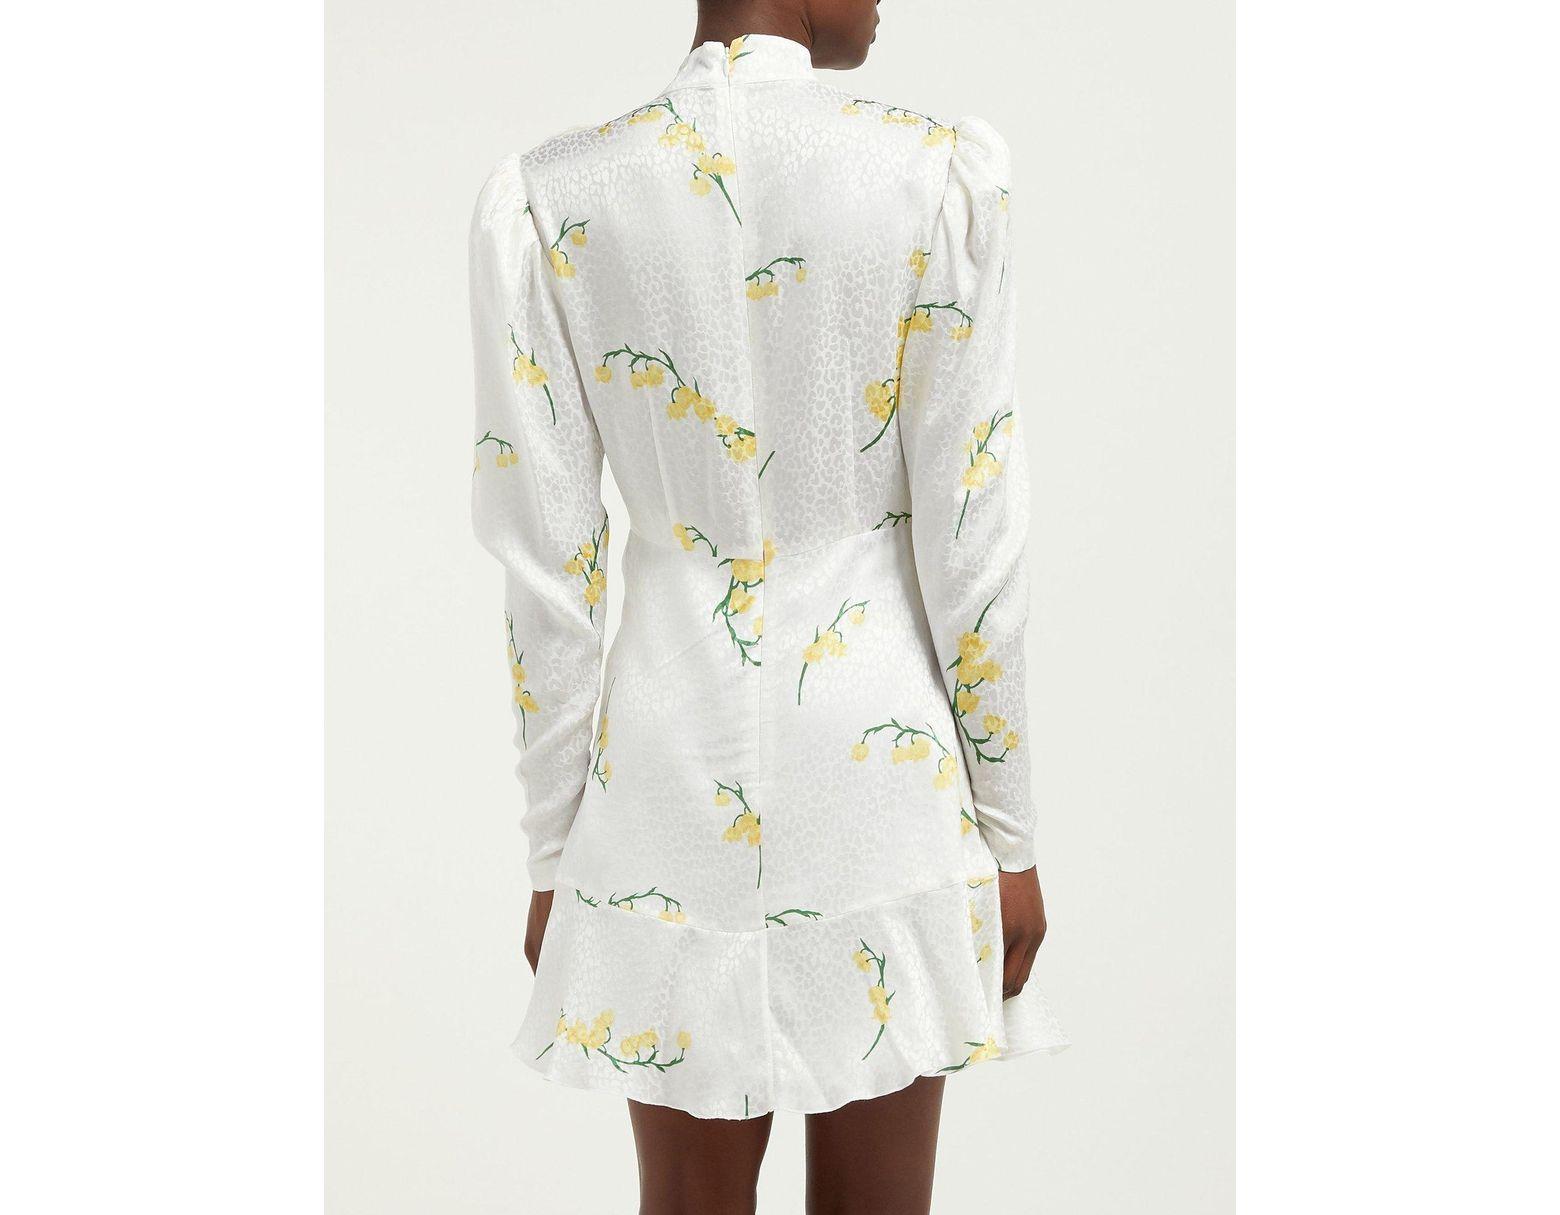 38ecc1a954c87 Alessandra Rich Floral Print Silk Devoré Mini Dress - Save 54% - Lyst